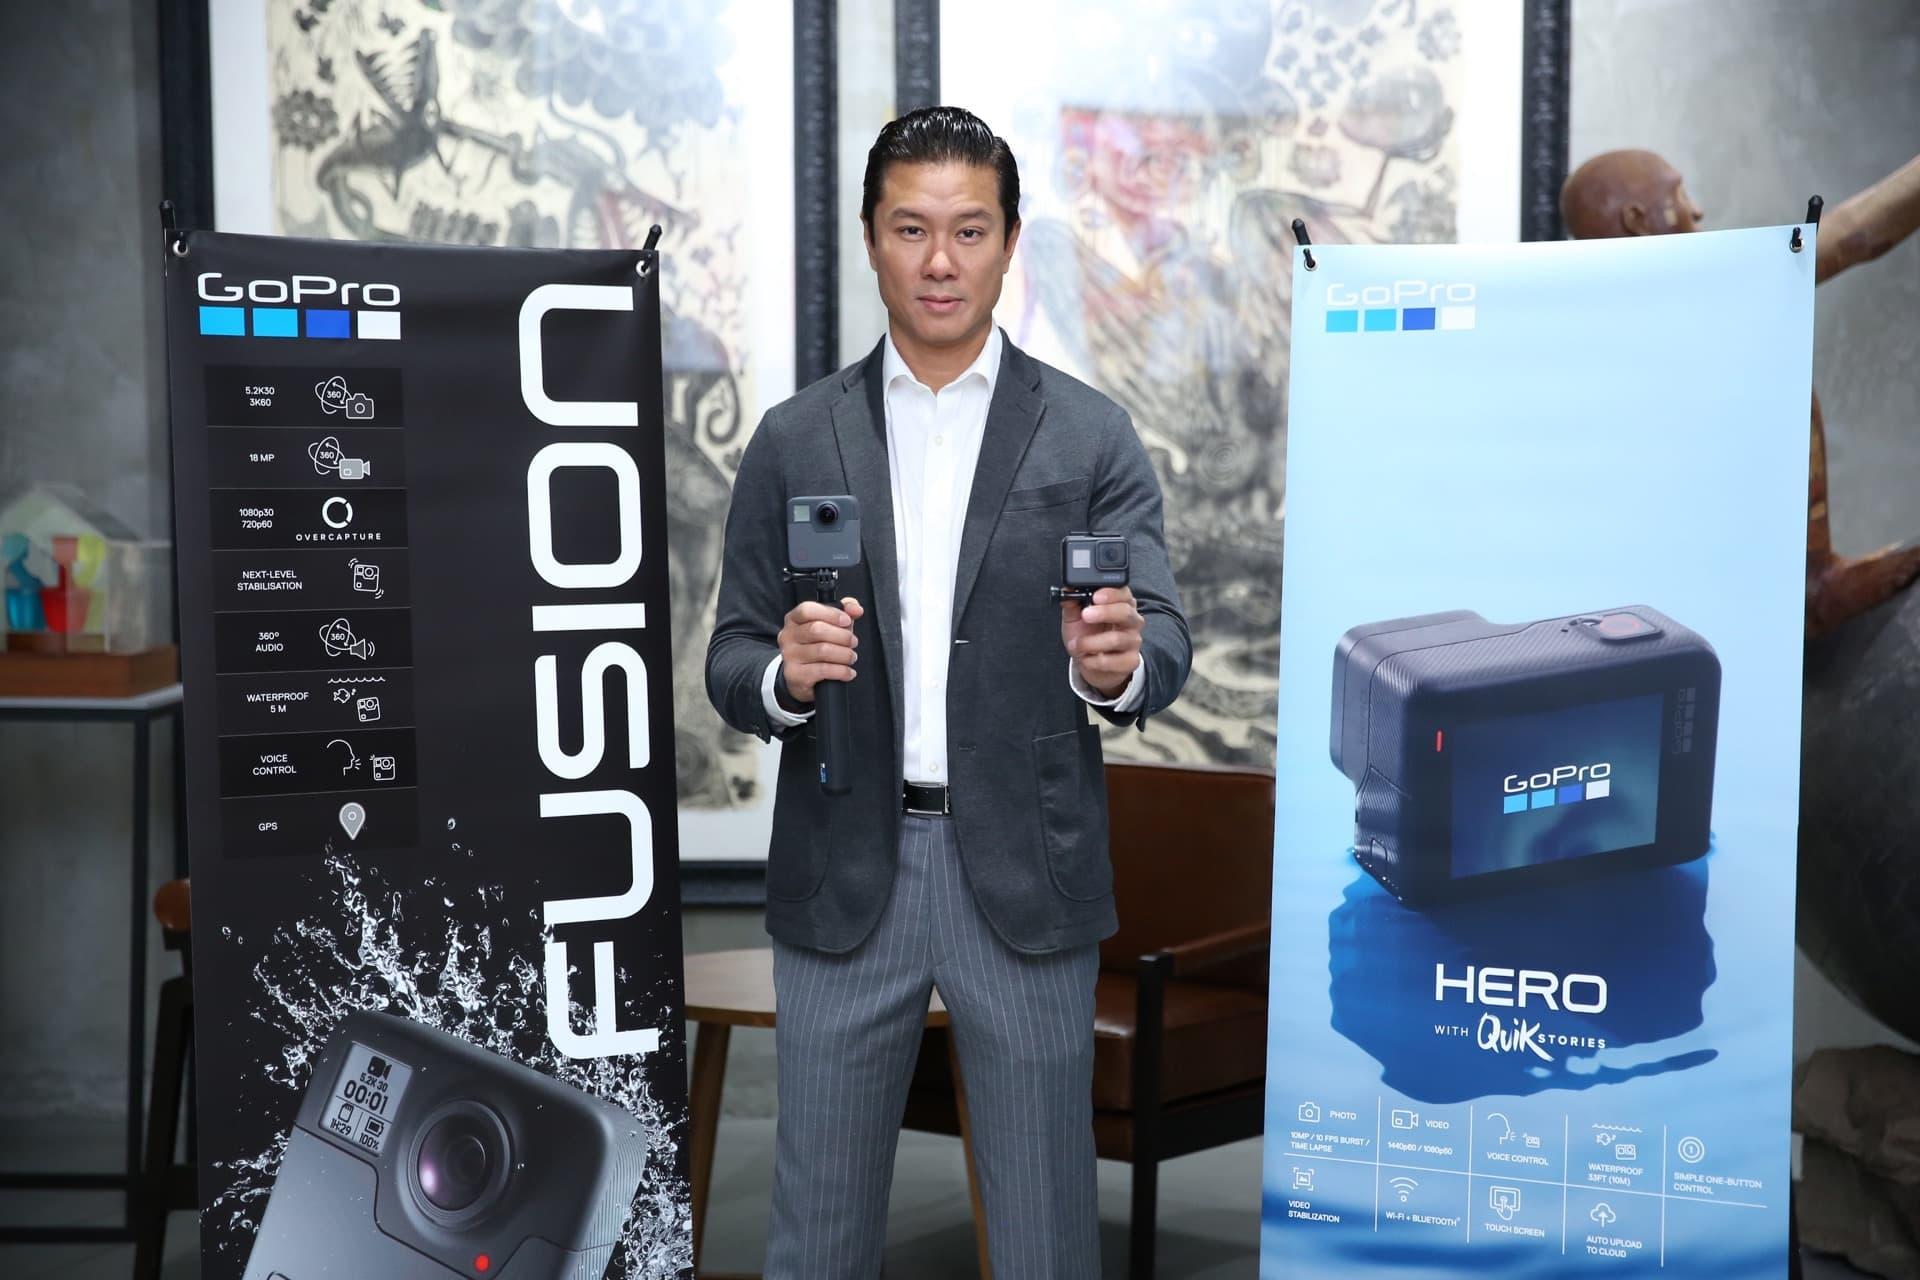 Gopro Fusion Hero Launch